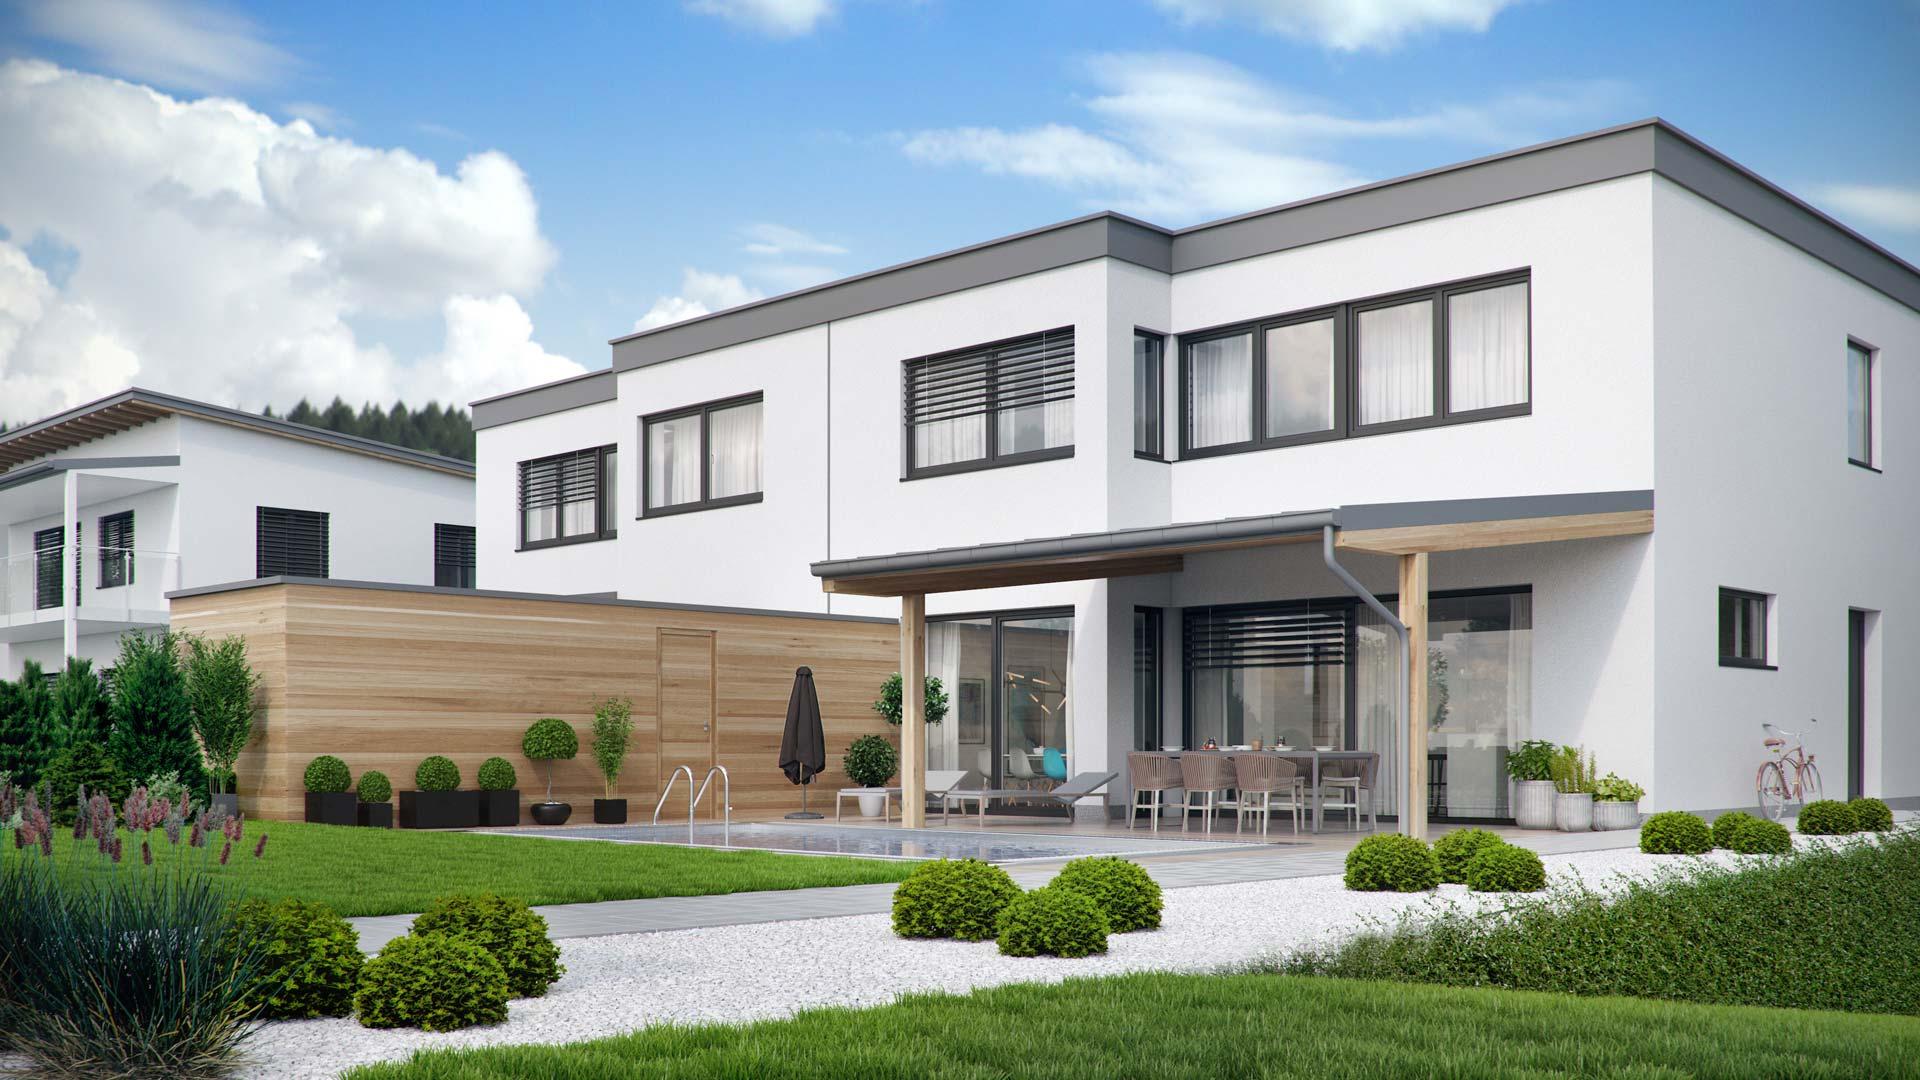 Modern Duplex House In Austria Viscato Media Photos And Videos 4 Archello